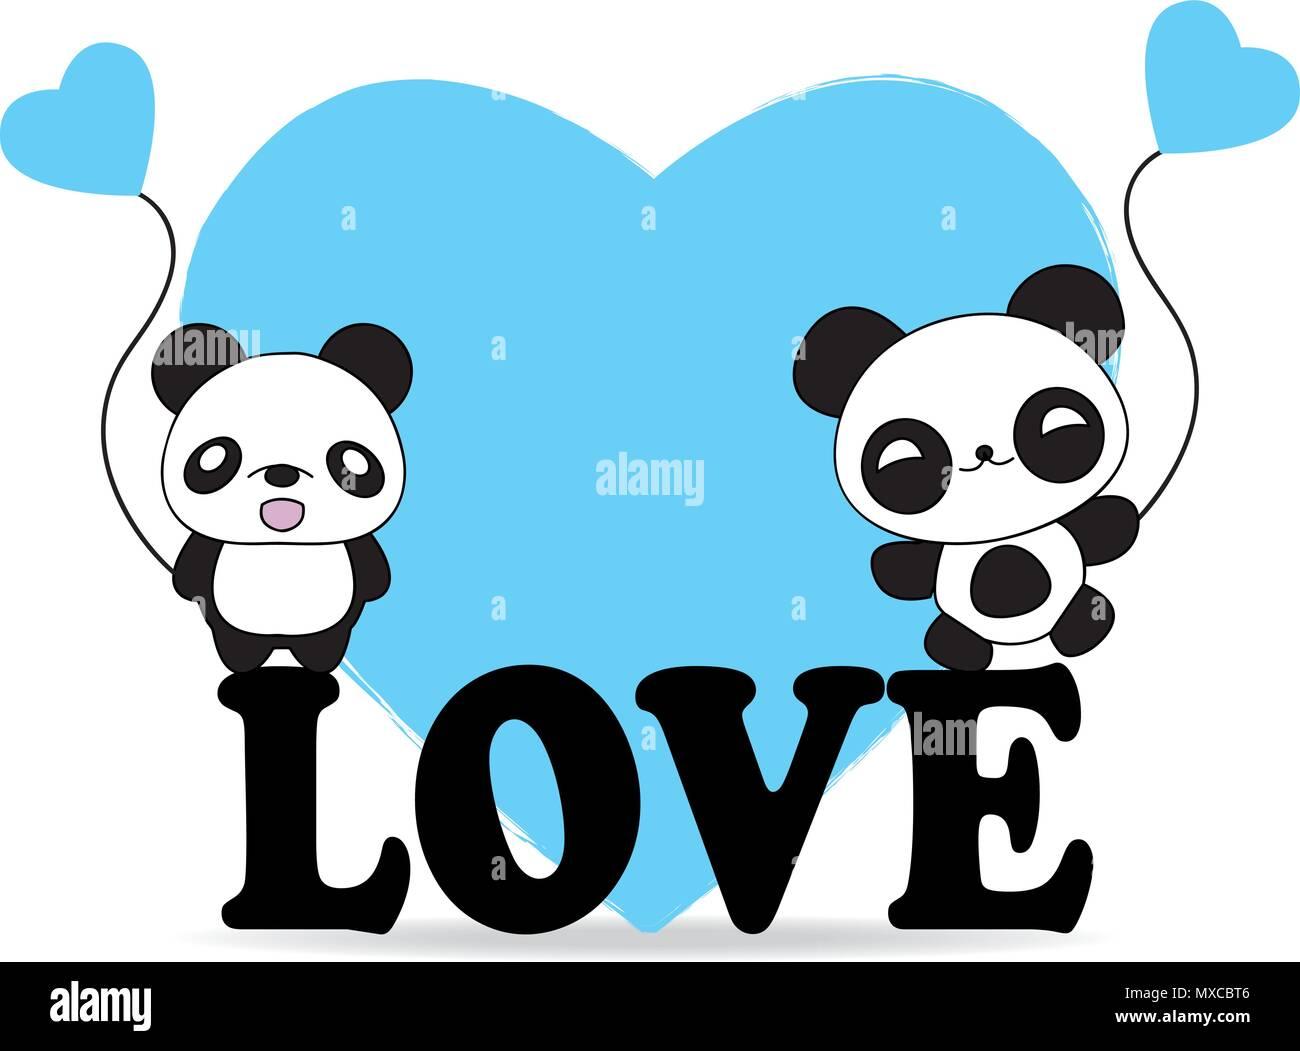 Cartoon Illustration Fat Panda Bear Stock Photos Cartoon